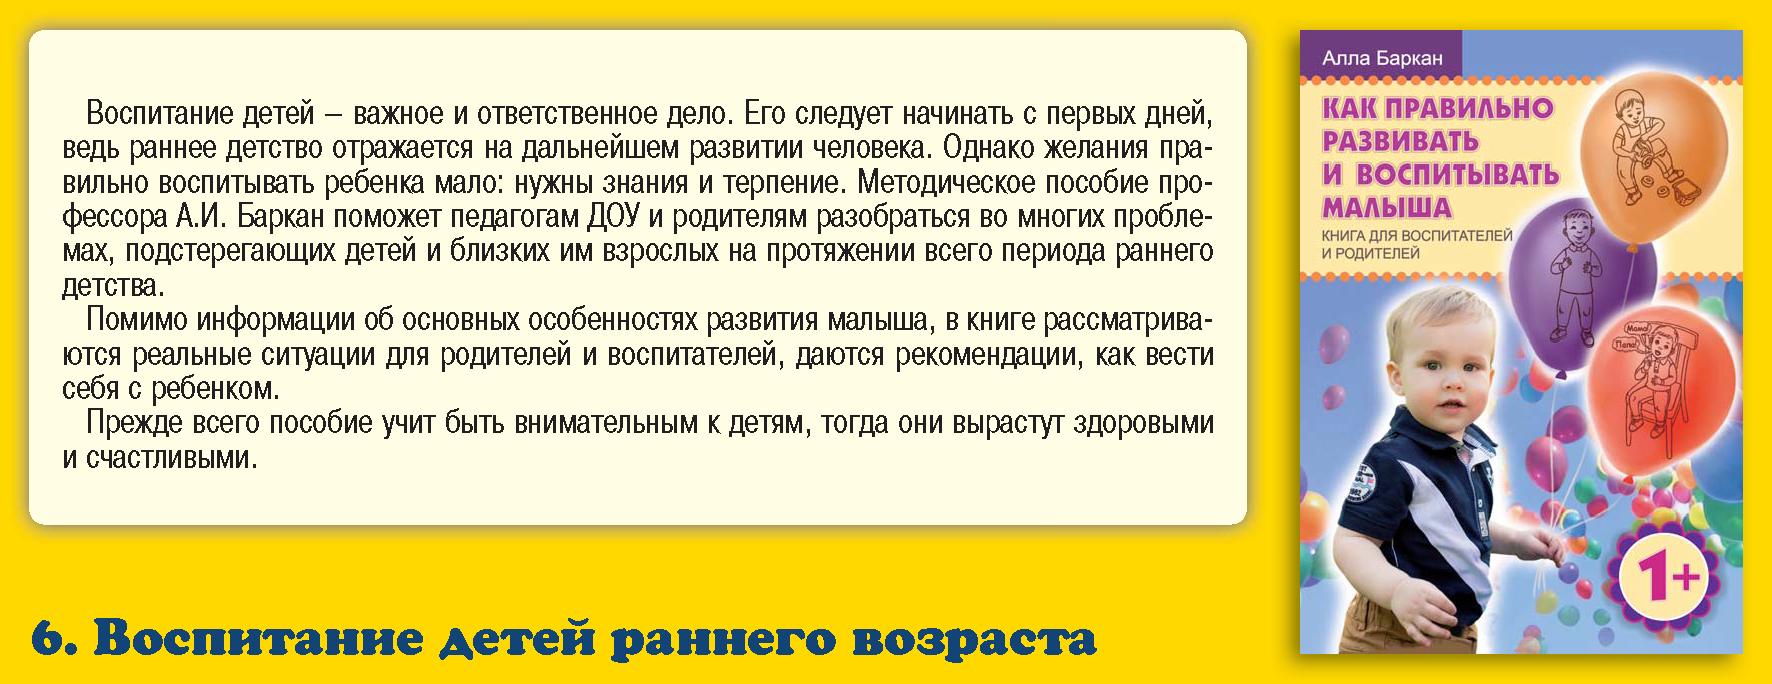 851-slaid-6_1_2-summ_stranica_10